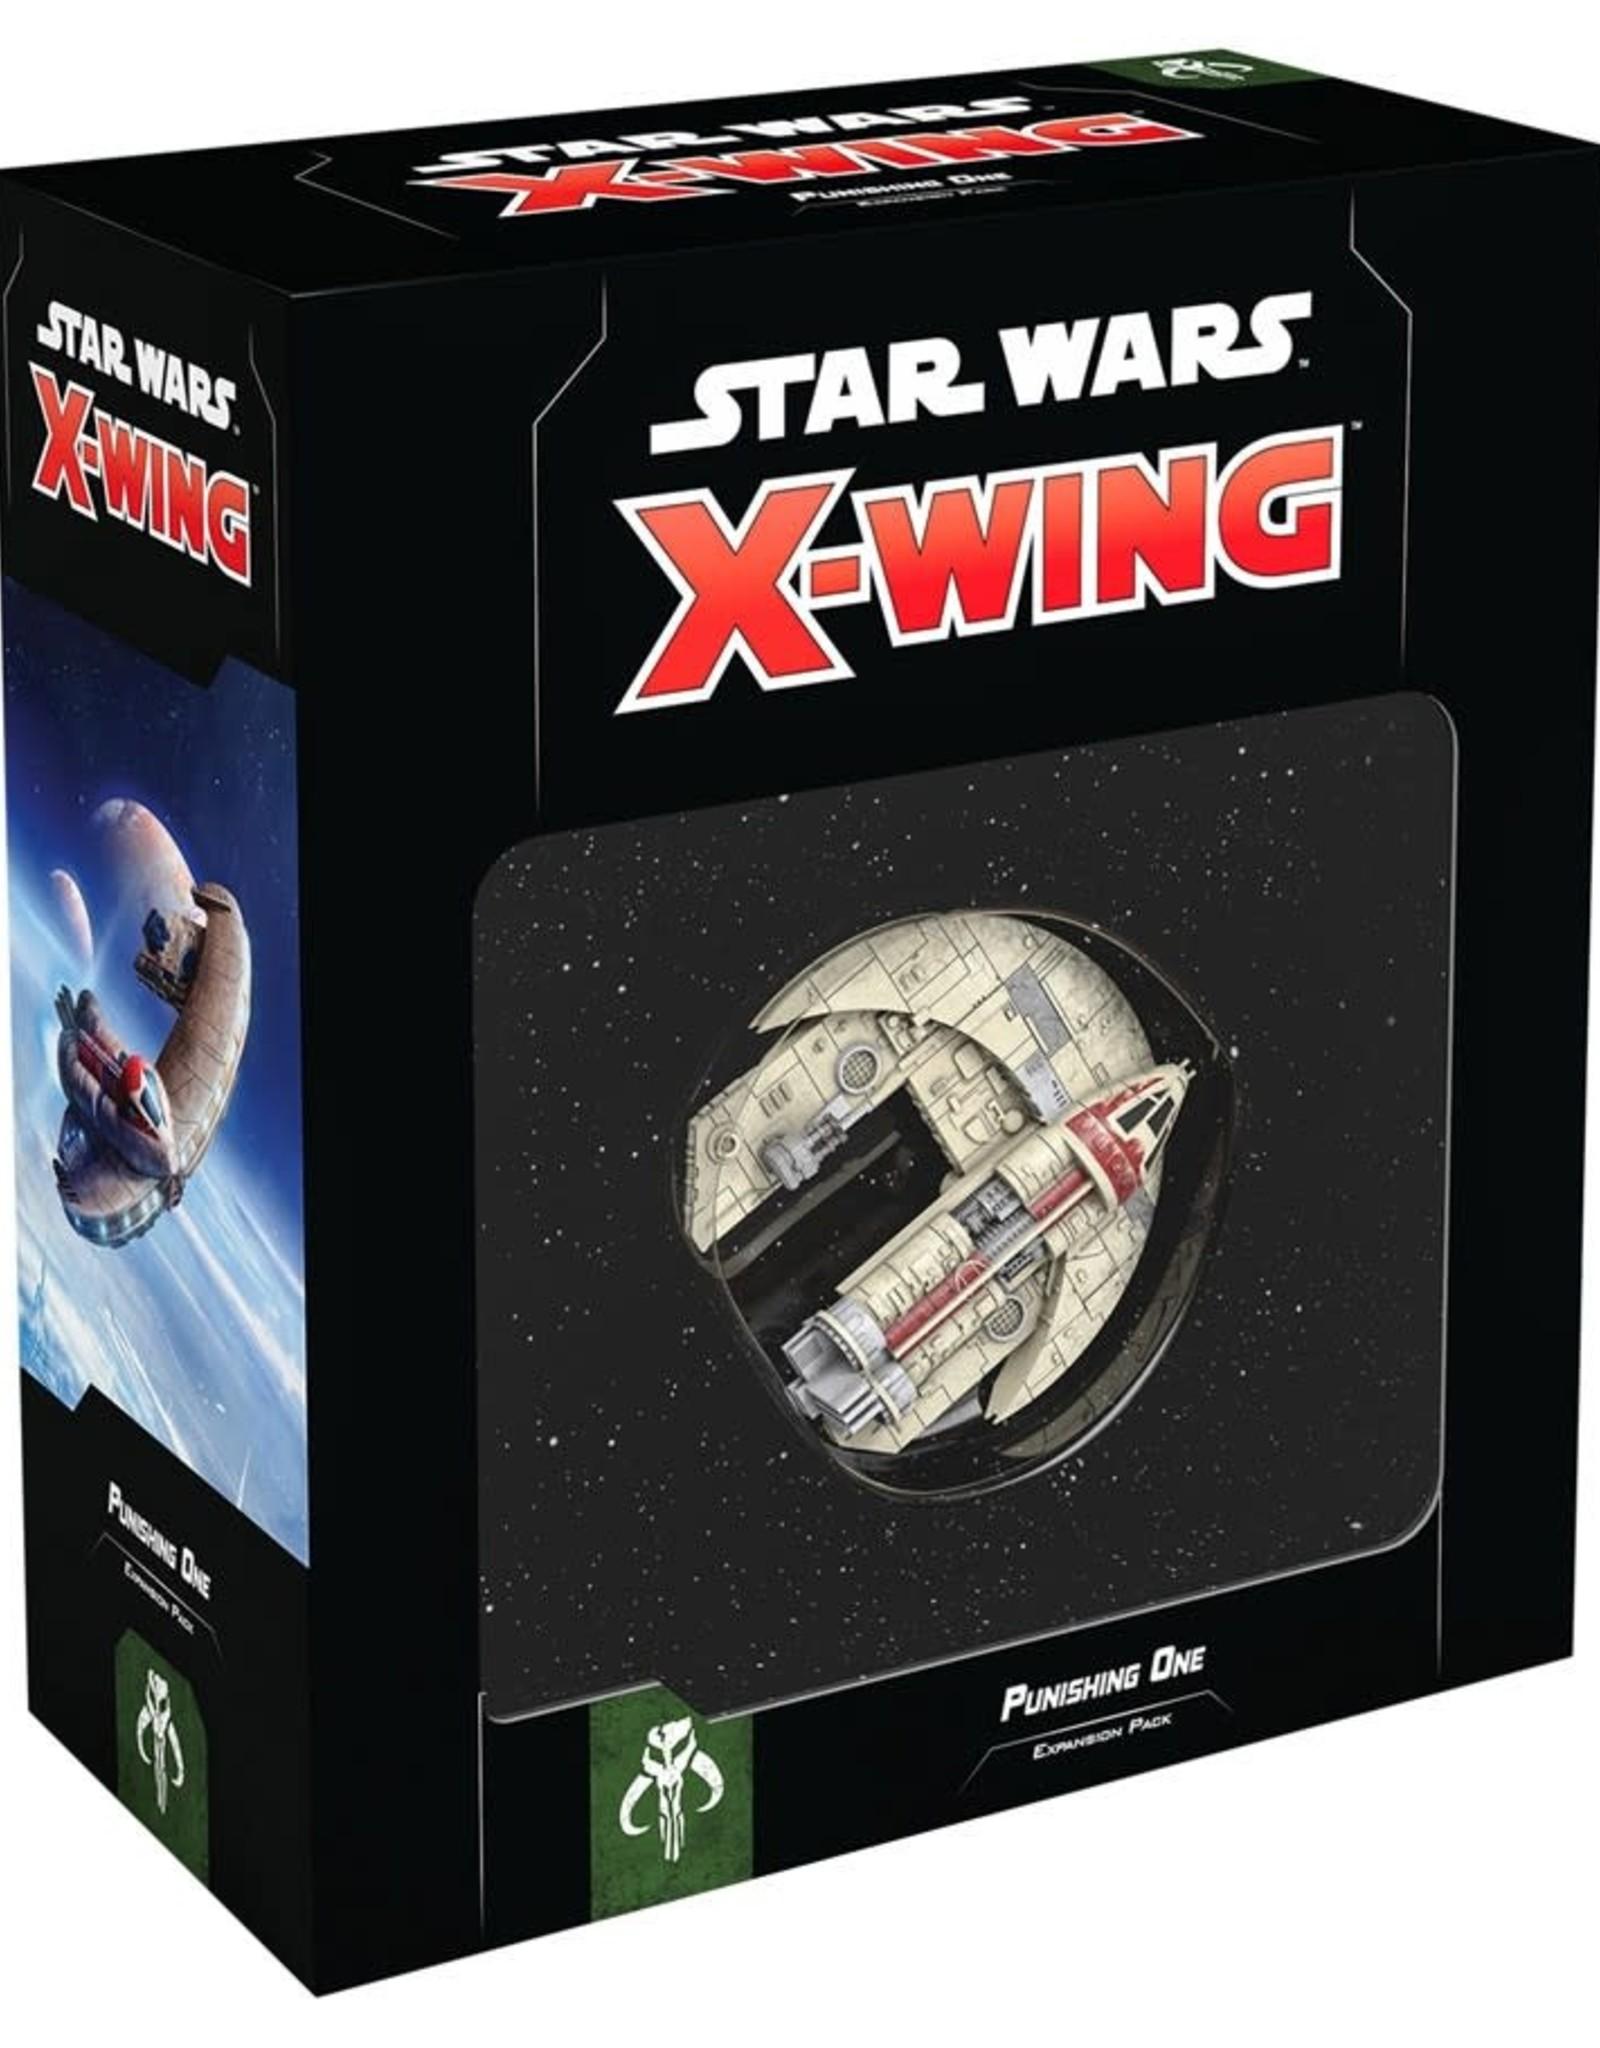 Fantasy Flight Games Star Wars X-Wing Punishing One Expansion